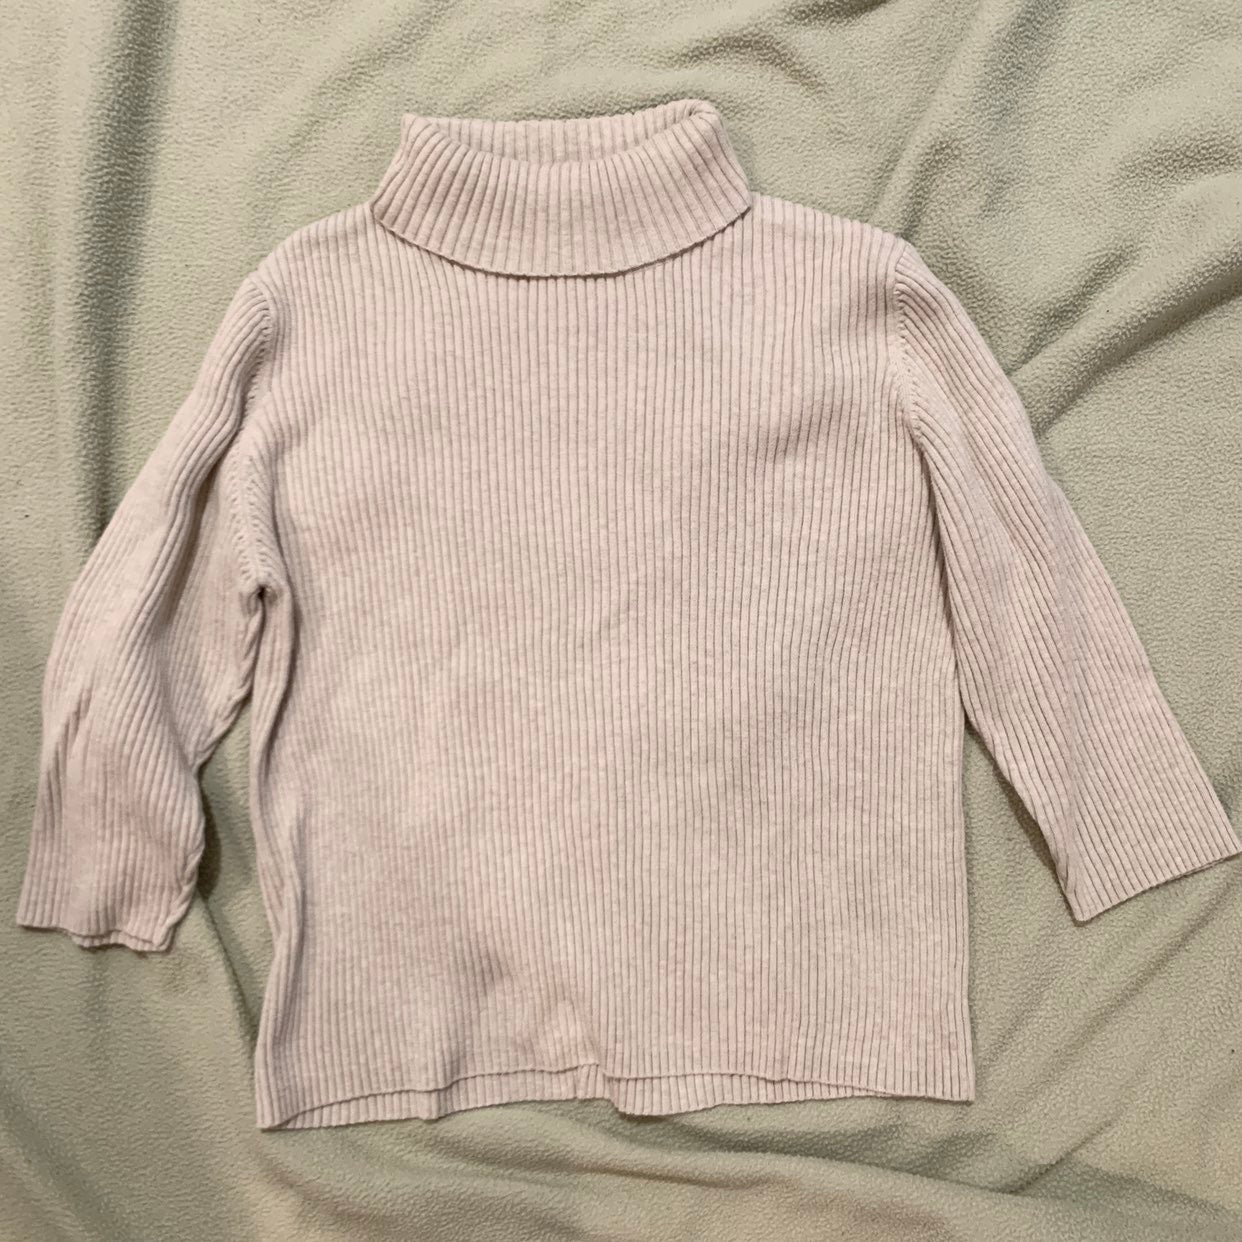 Beige Turtleneck 3/4 sleeve sweater